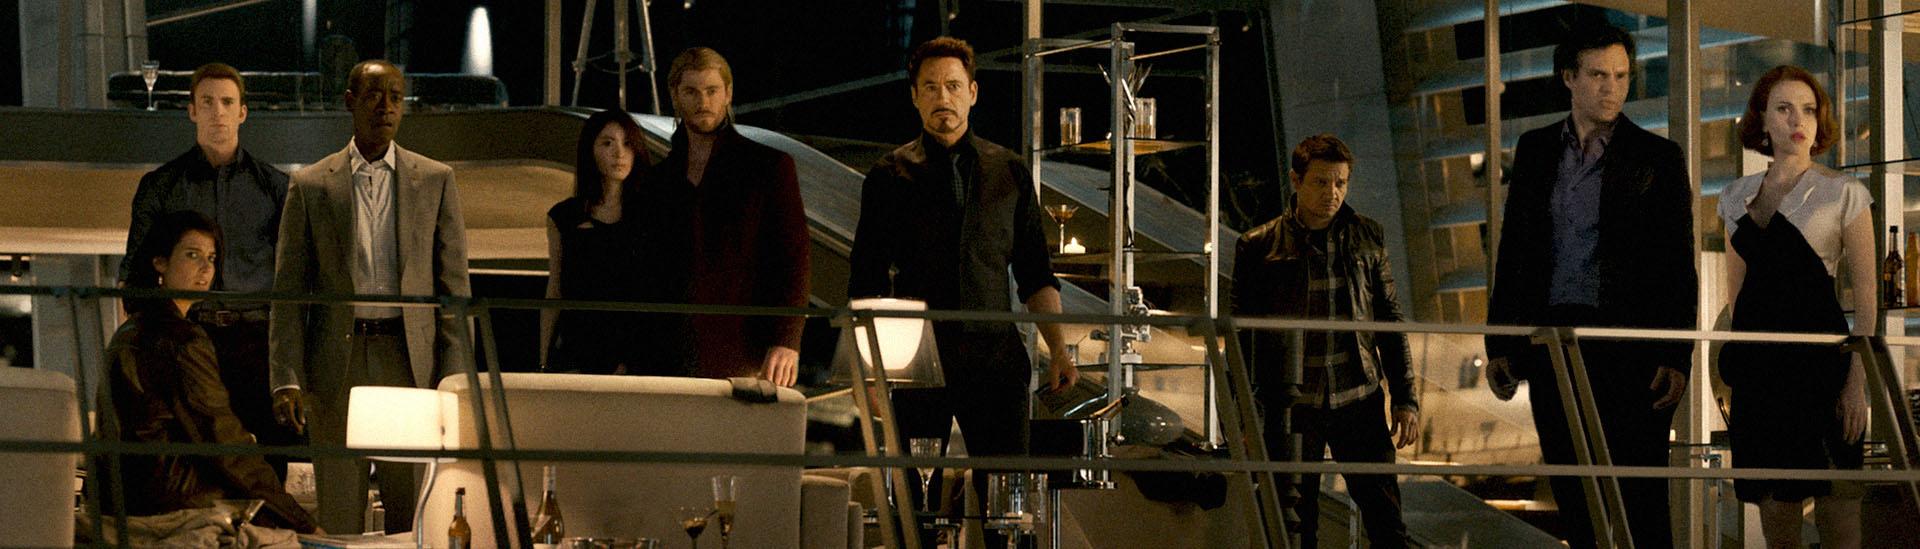 Baner filmu 'Avengers: Czas Ultrona'